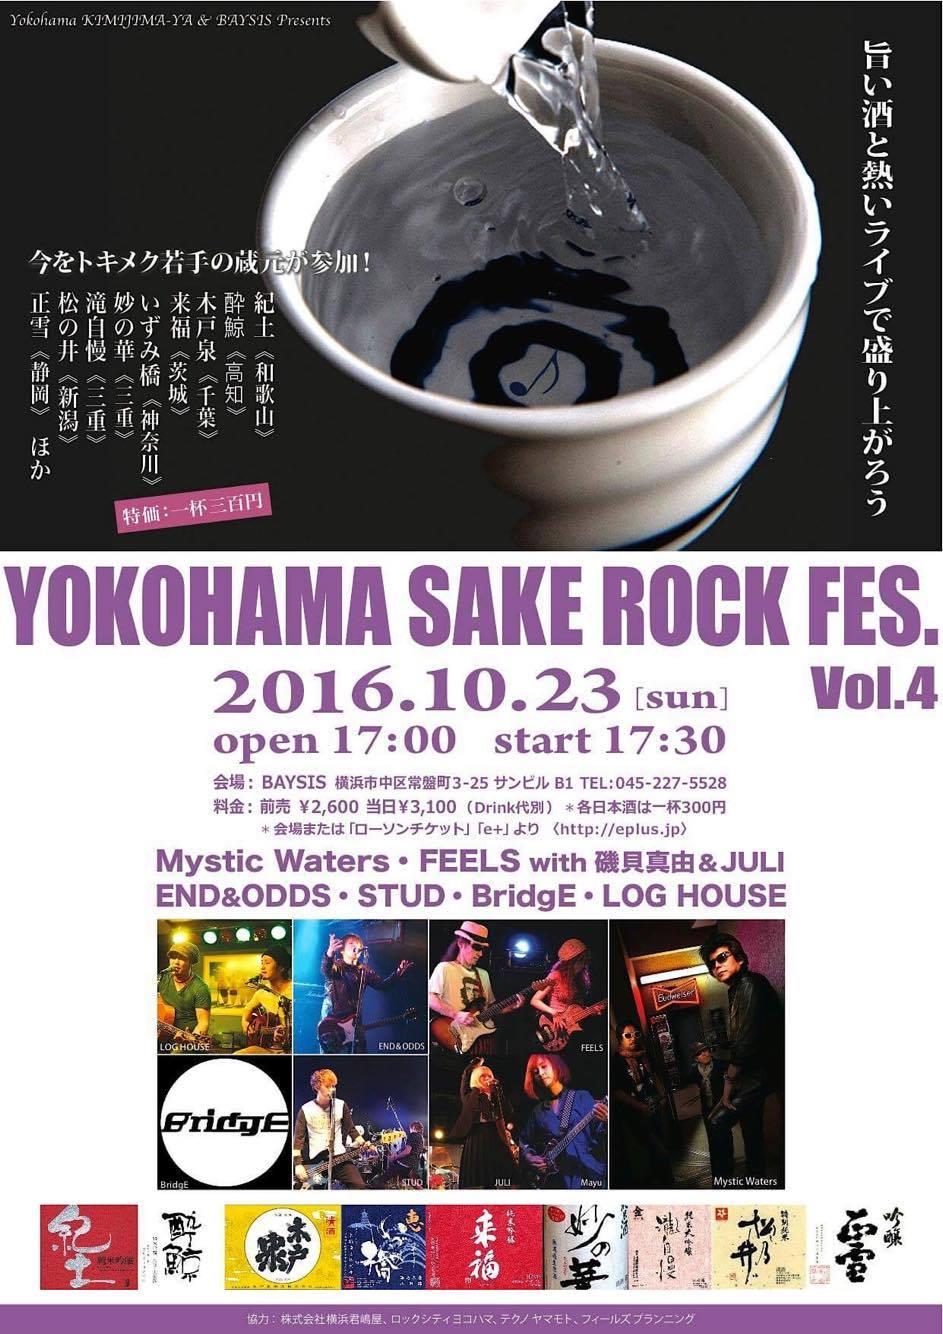 YOKOHAMA SAKE ROCK FES. Vol.4 @ BAYSIS | 横浜市 | 神奈川県 | 日本